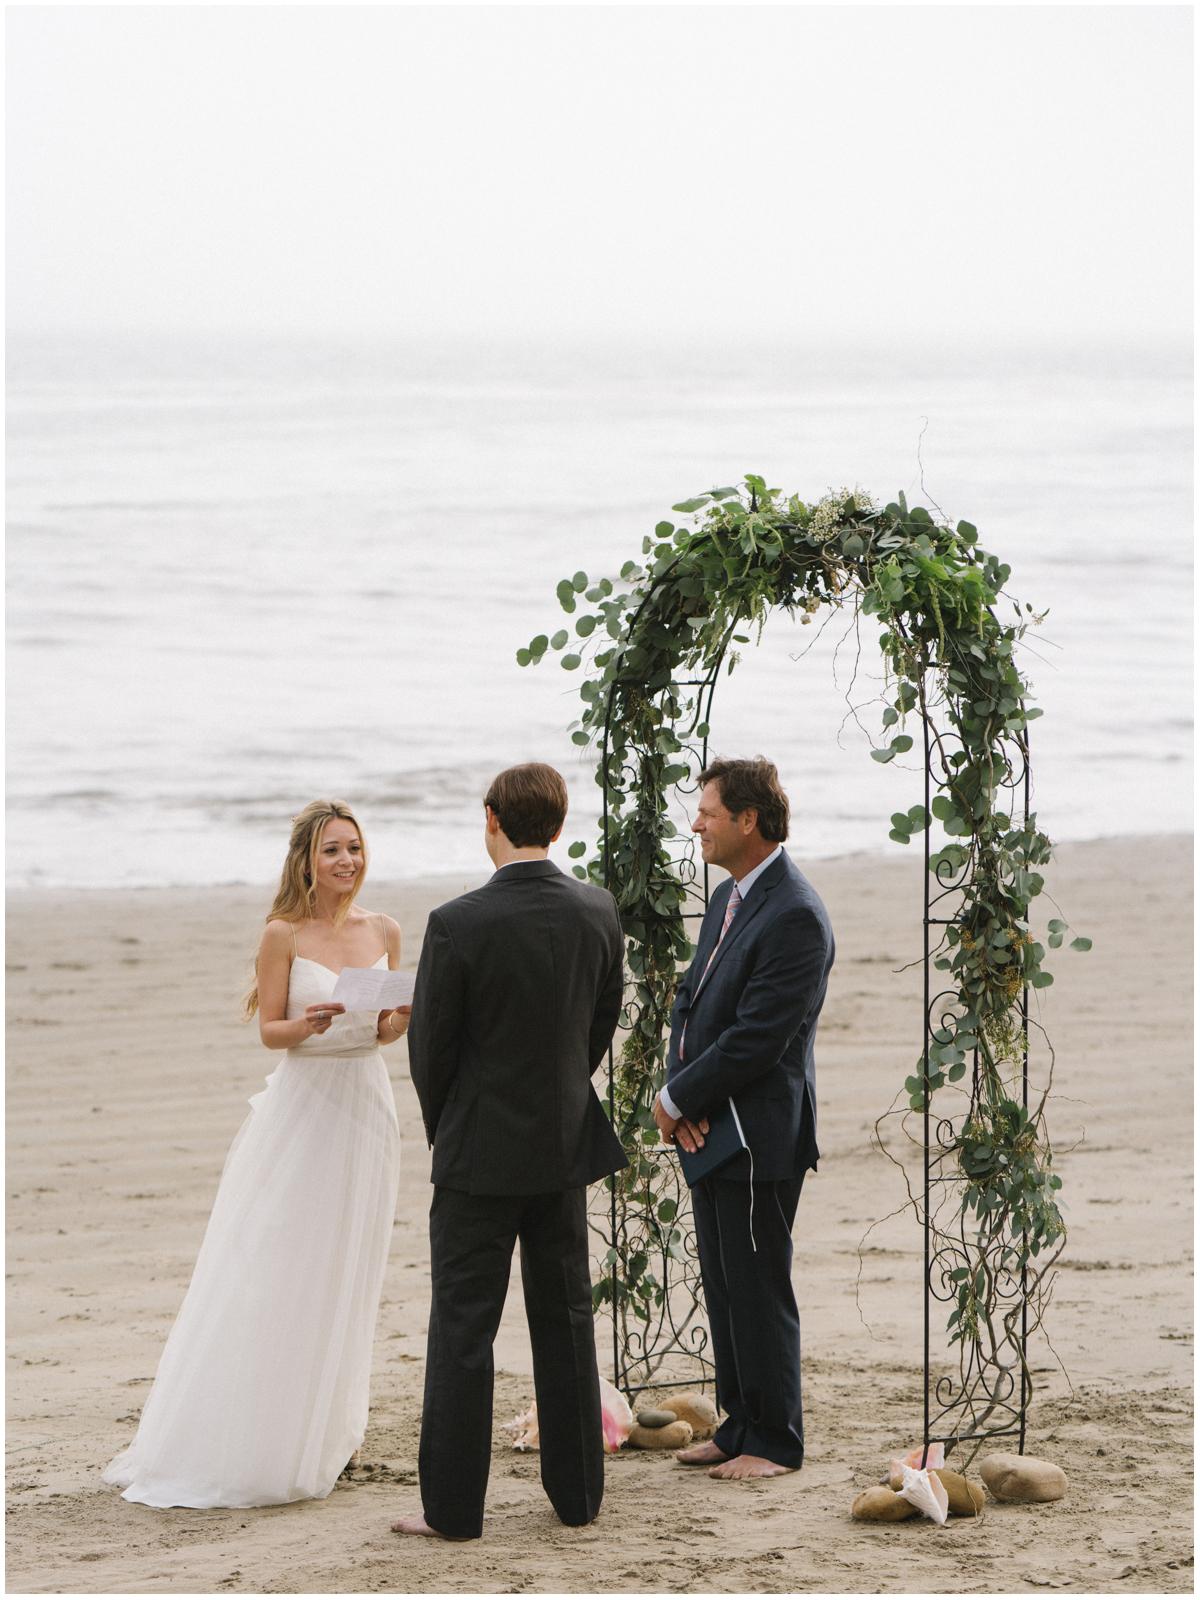 Santa Babara Elopement Wedding Photographer - Pinnel Photography-01-07.jpg